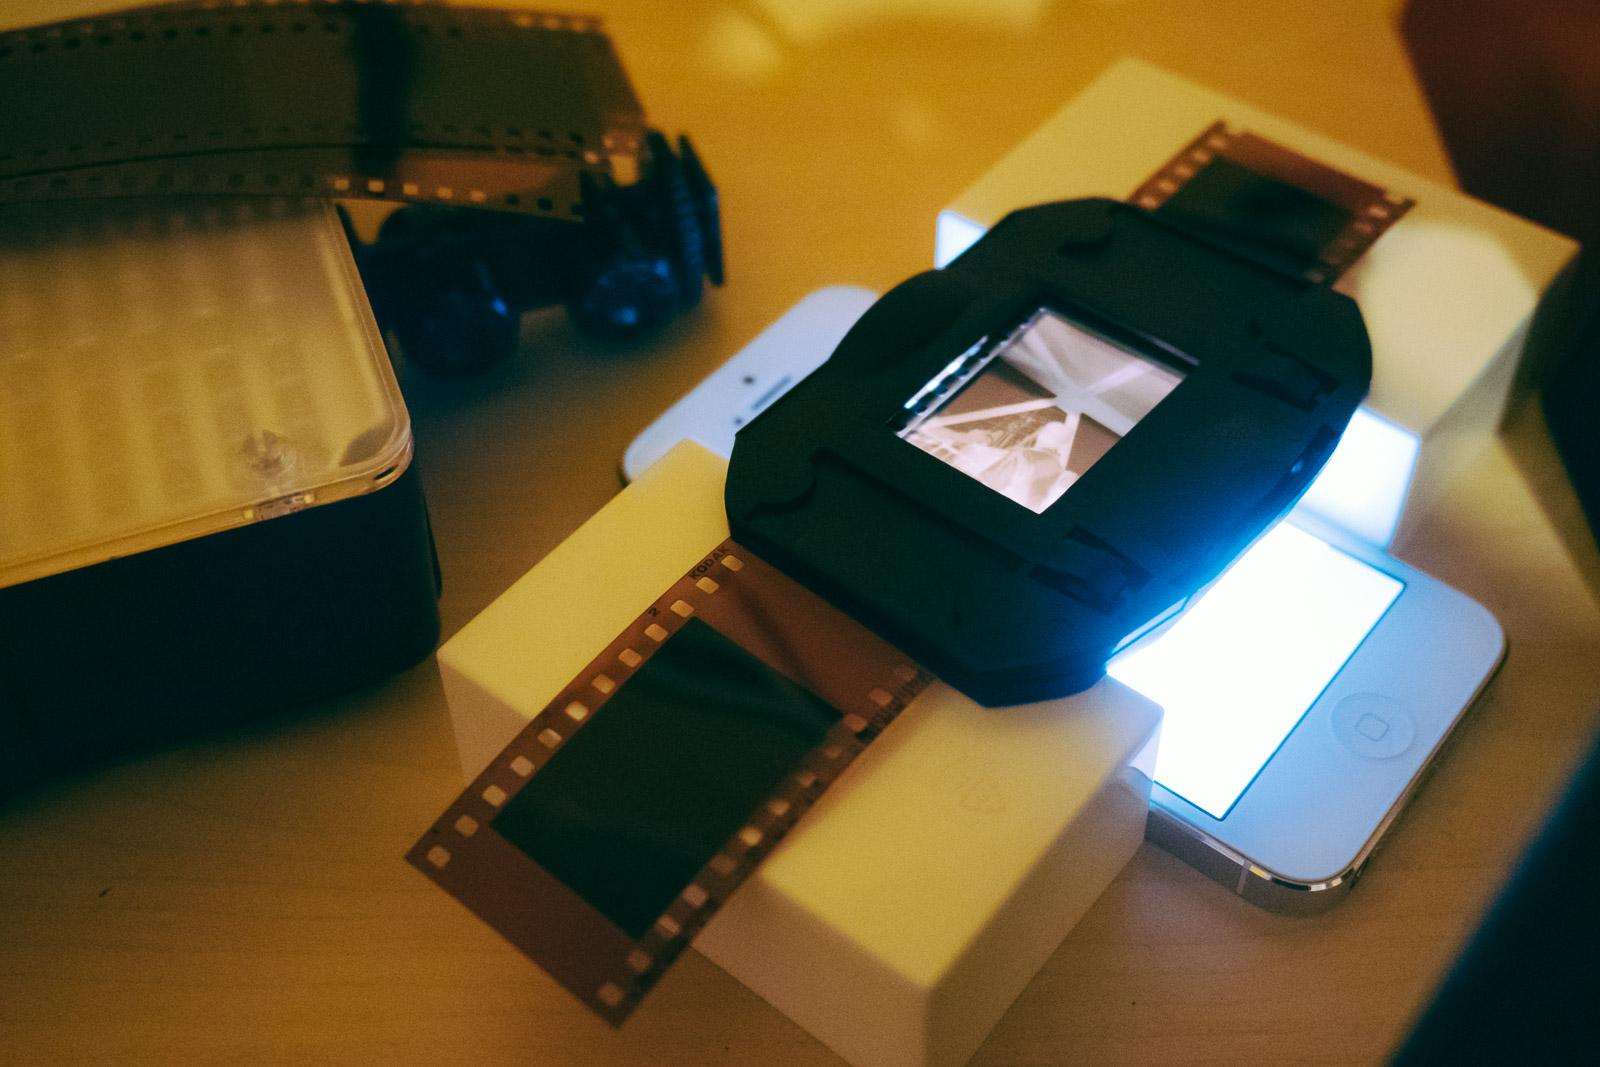 negative digitalisieren ohne scanner ansichten. Black Bedroom Furniture Sets. Home Design Ideas